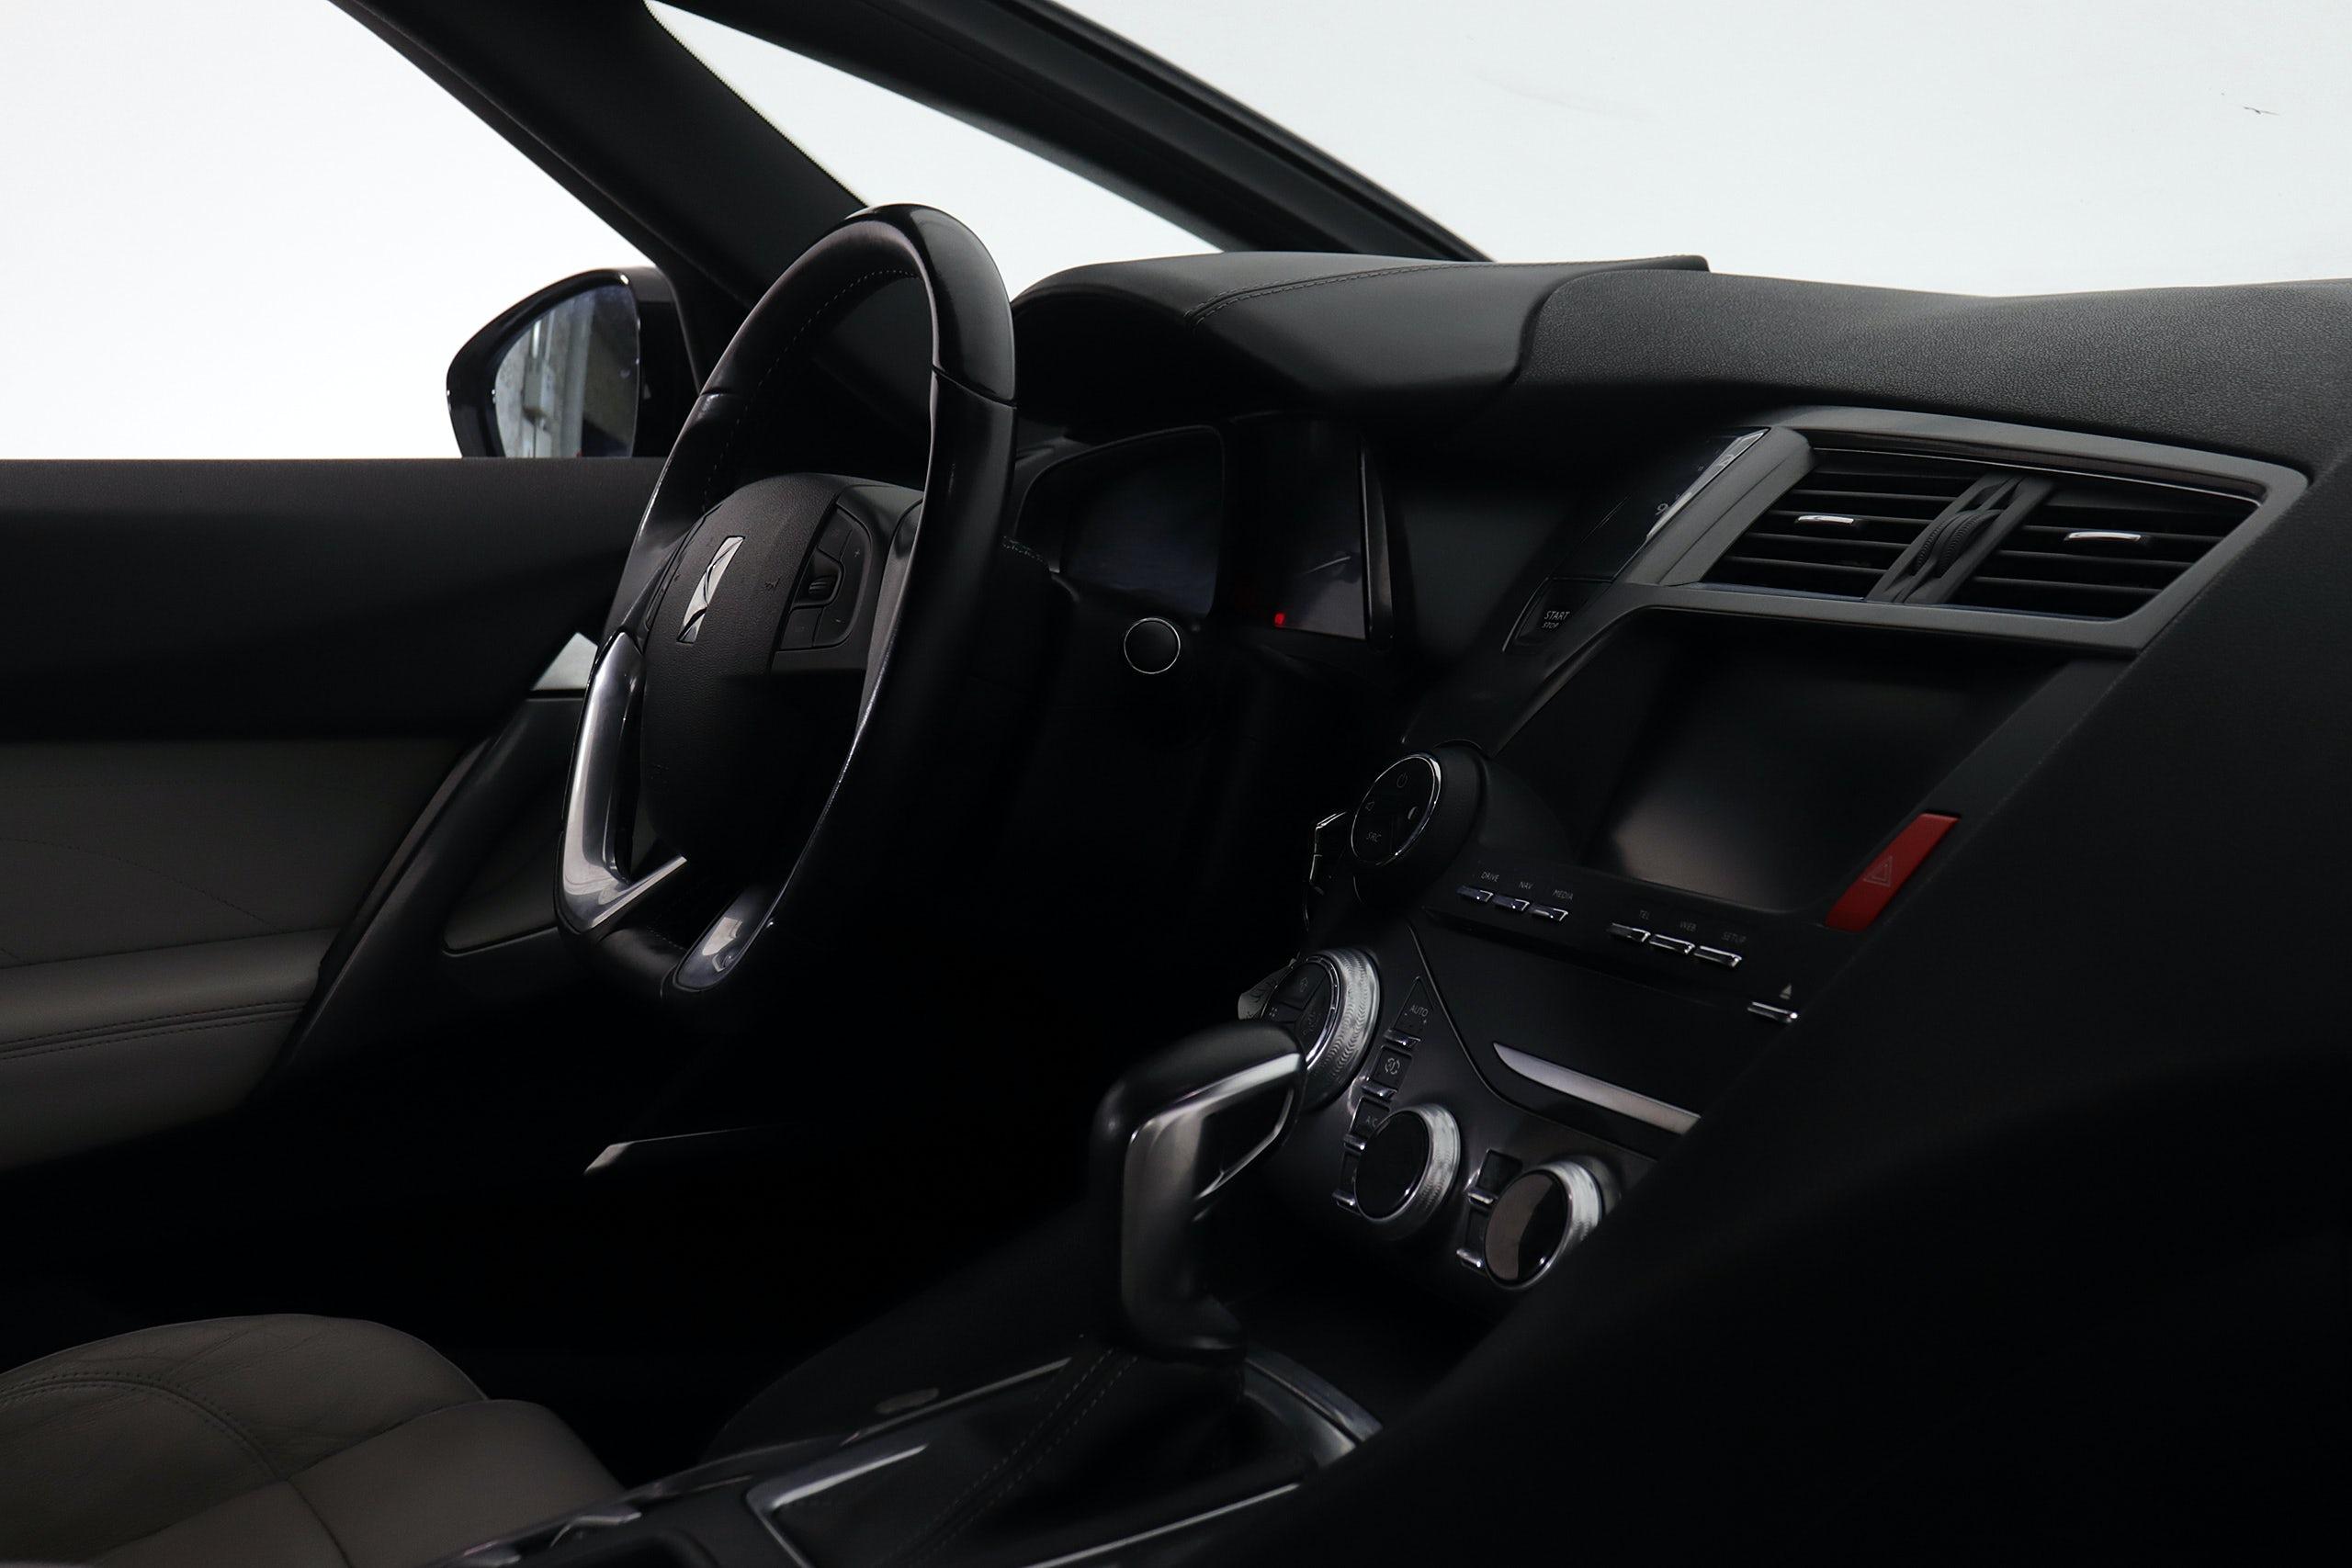 Citroen Ds5 2.0 BlueHDi 180cv Sport 5p Auto - Foto 18